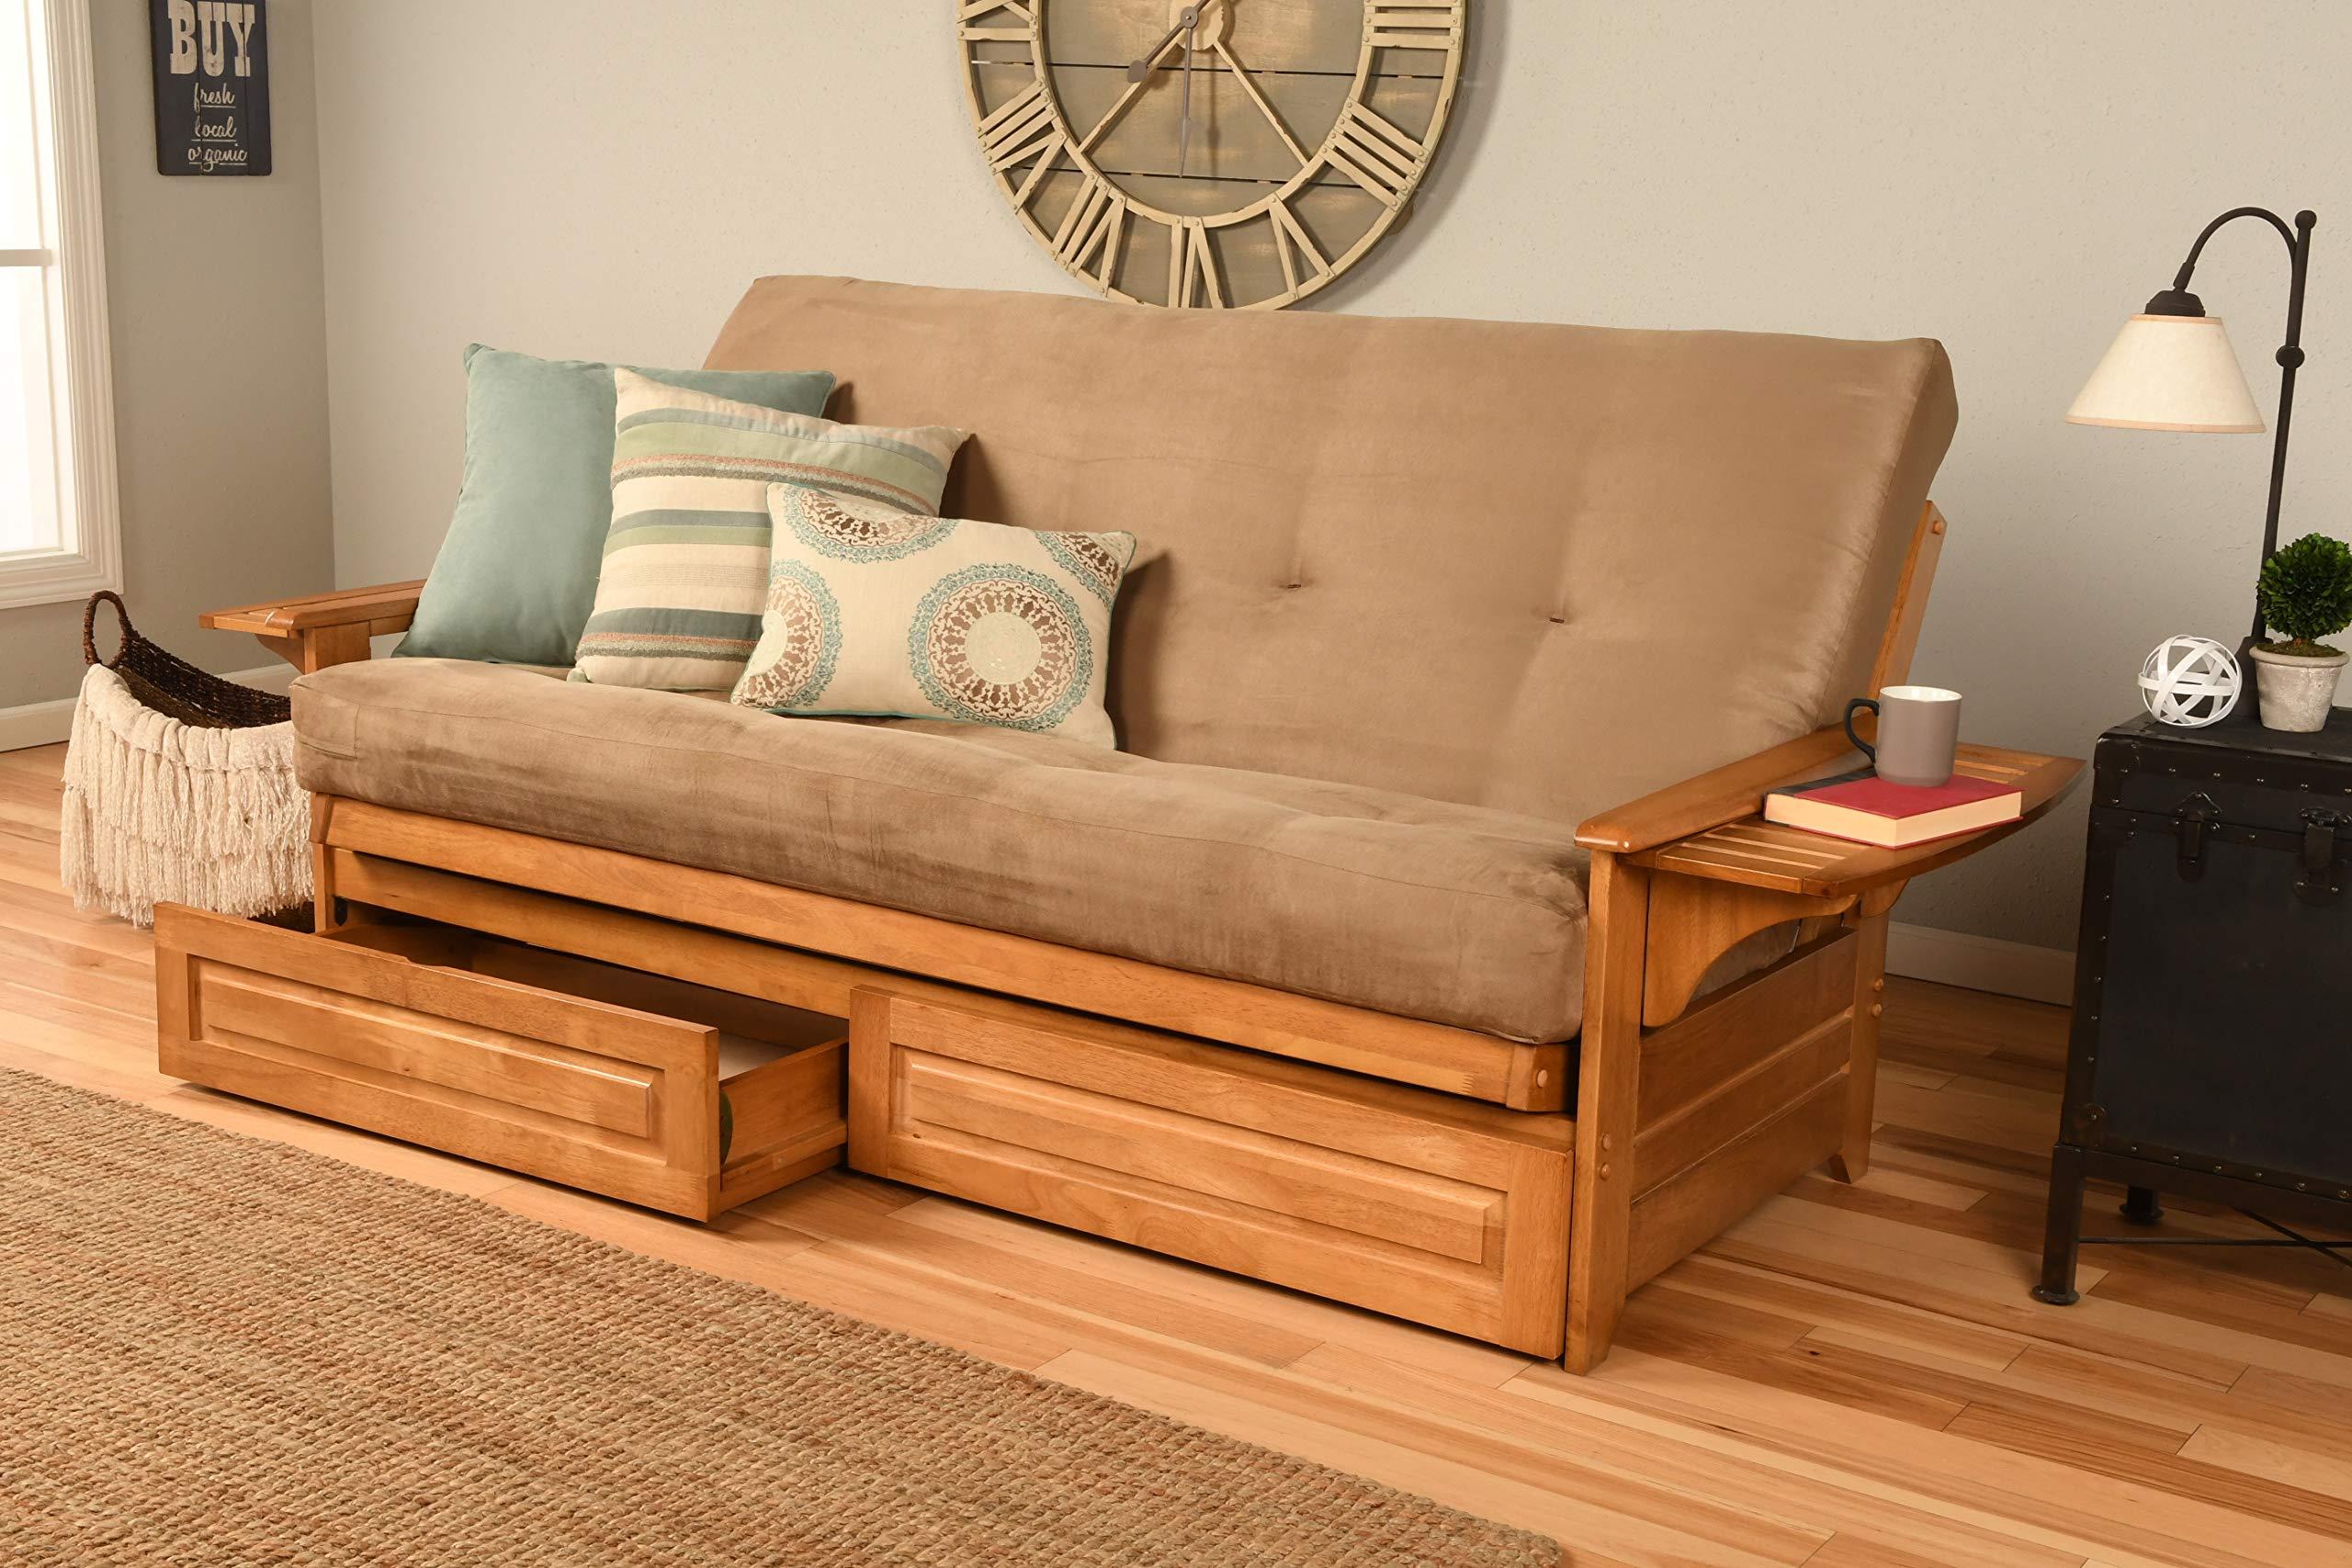 Kodiak Furniture 760719 Phoenix Full Size Futon in Butternut Finish with Storage Drawers, Suede Peat by Kodiak Furniture